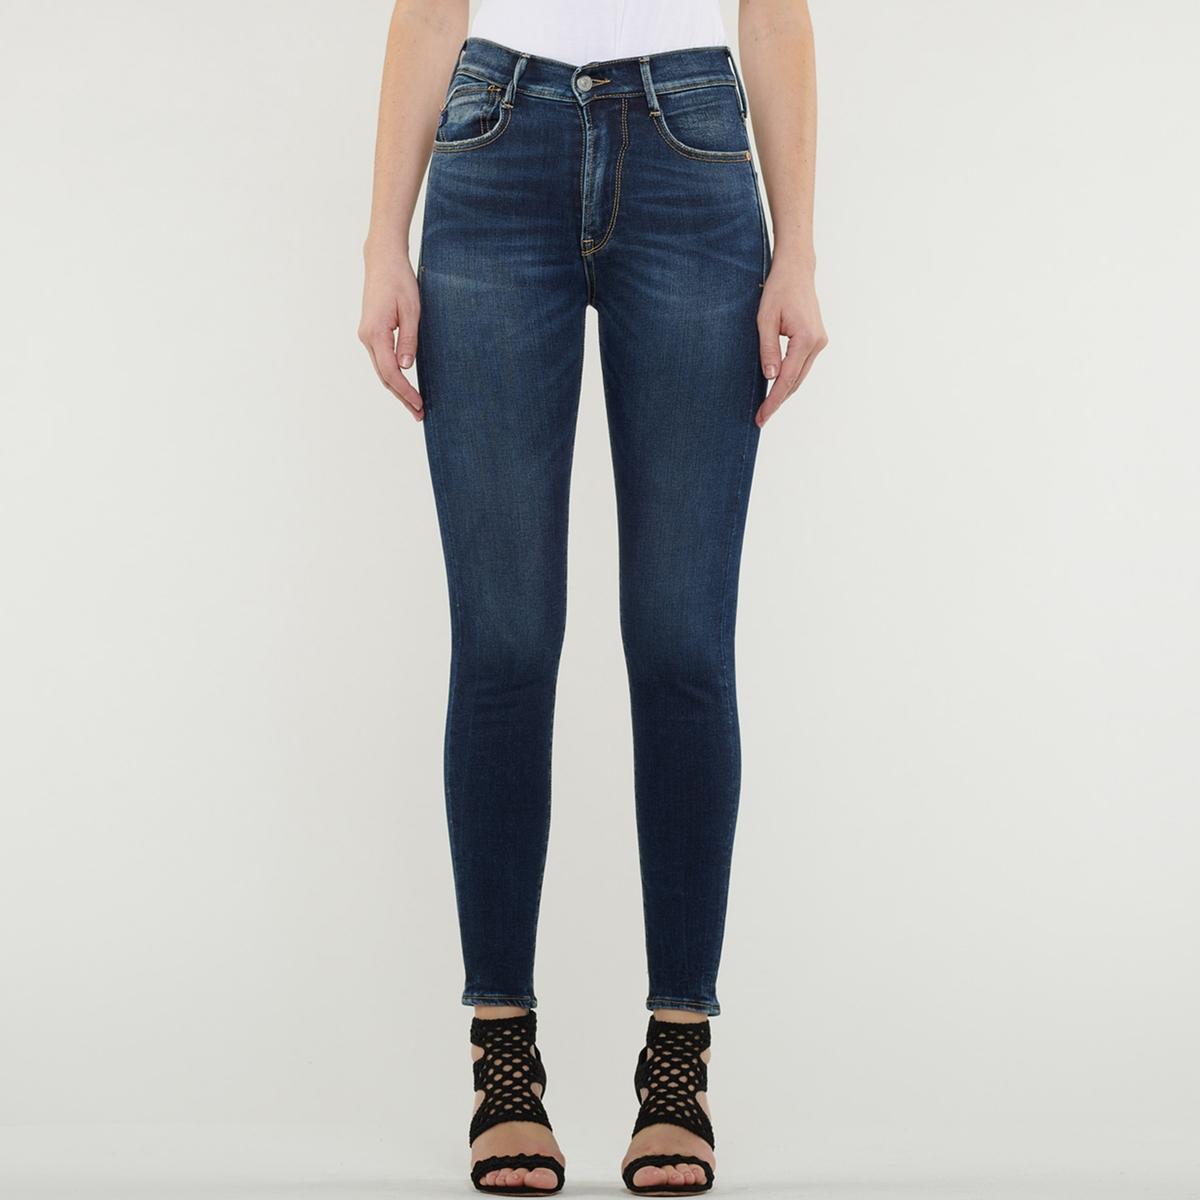 Jeans skinny, cintura subida